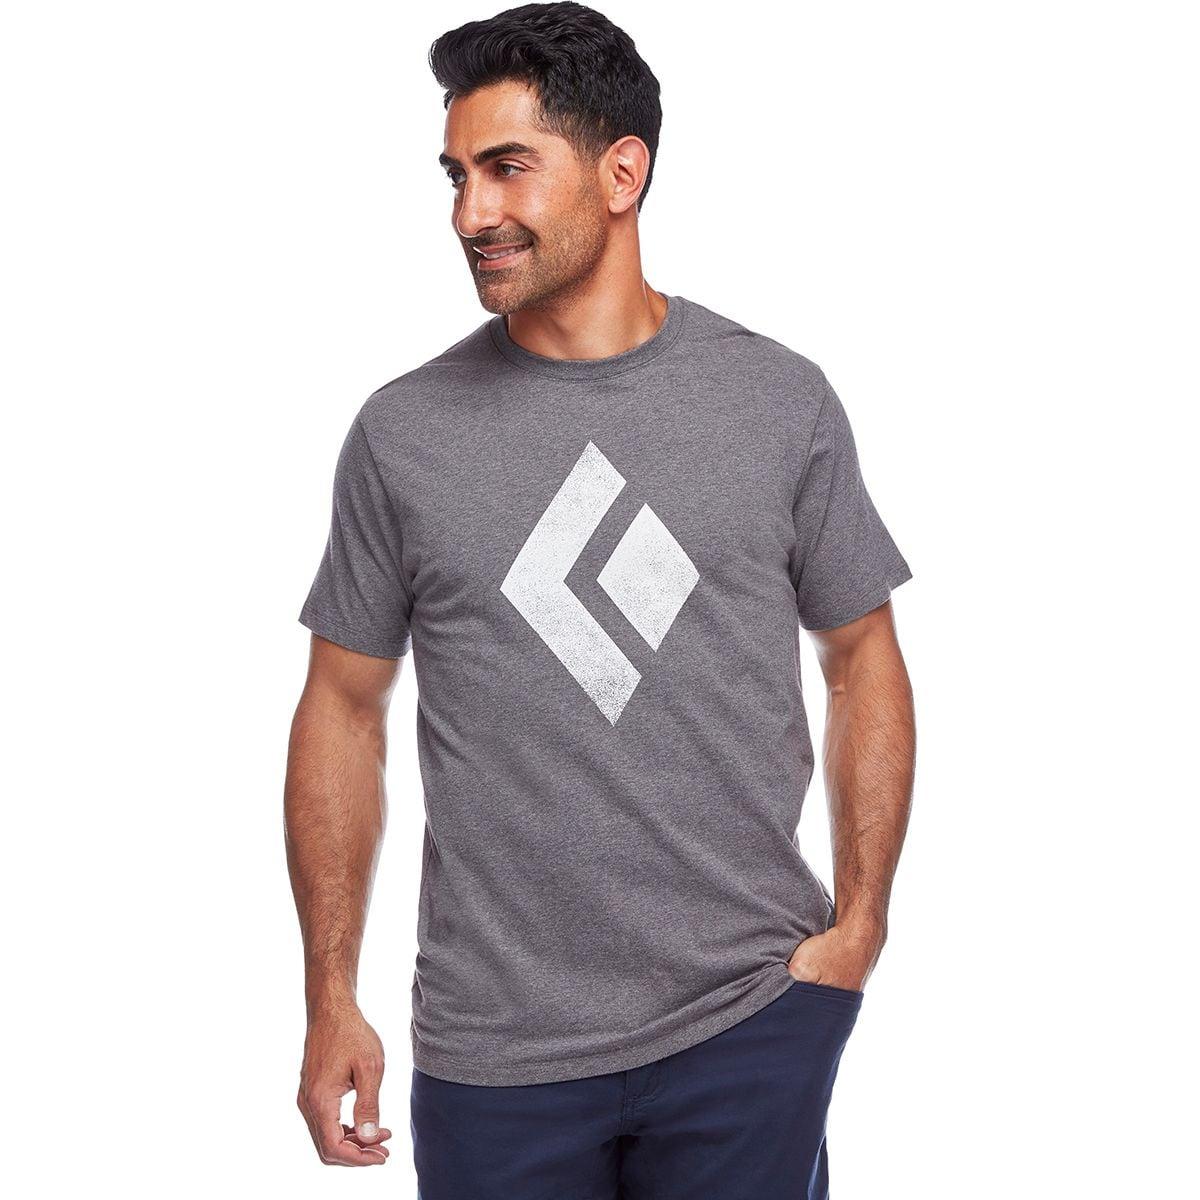 Chalked Up T-Shirt - Men